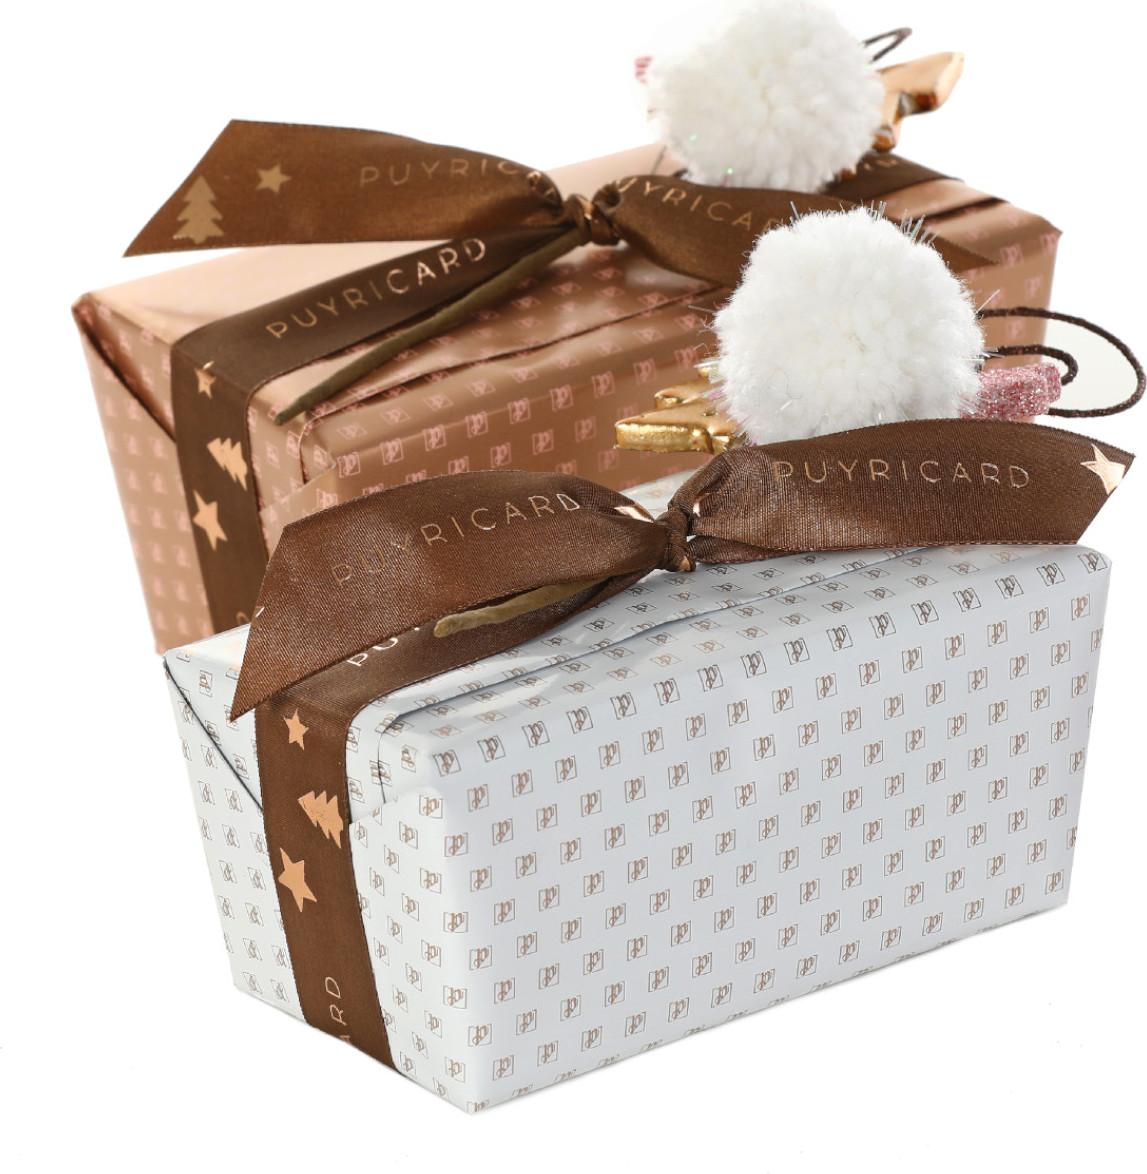 BALLOTIN BOX OF DARK OR MILK CHOCOLATE AMANDAS AND AVELINAS 1 KG